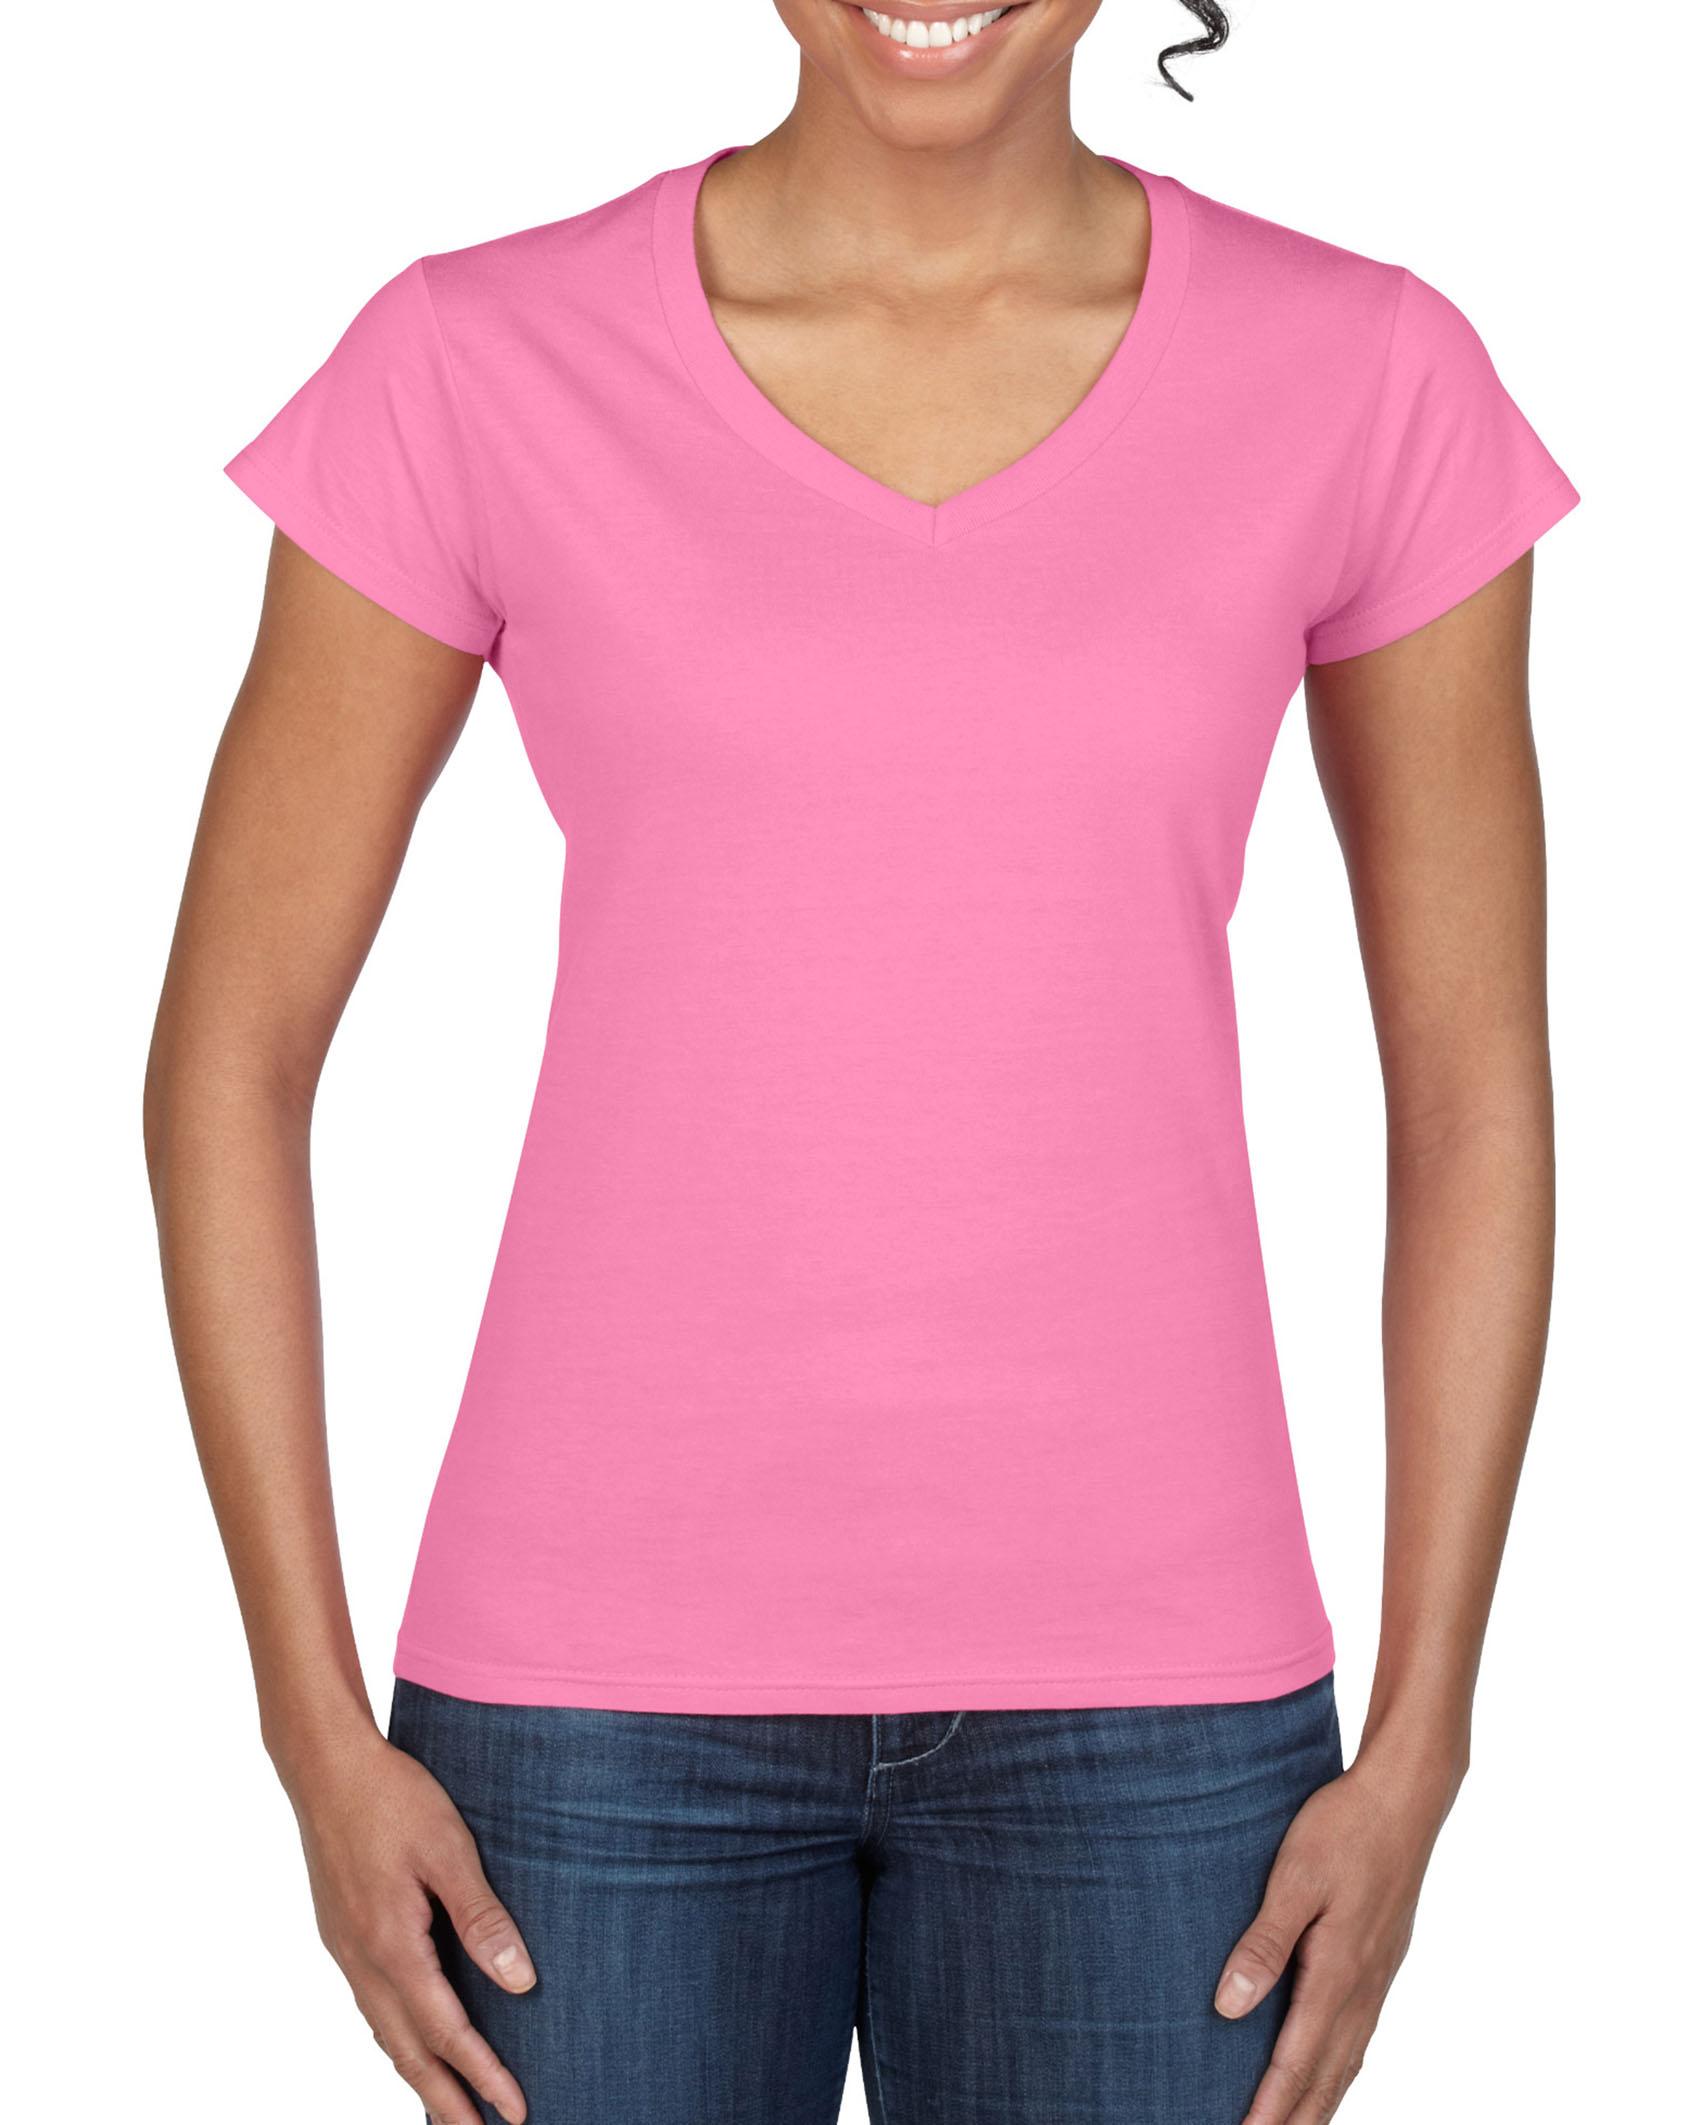 Gildan T-shirt V-Neck SoftStyle for her